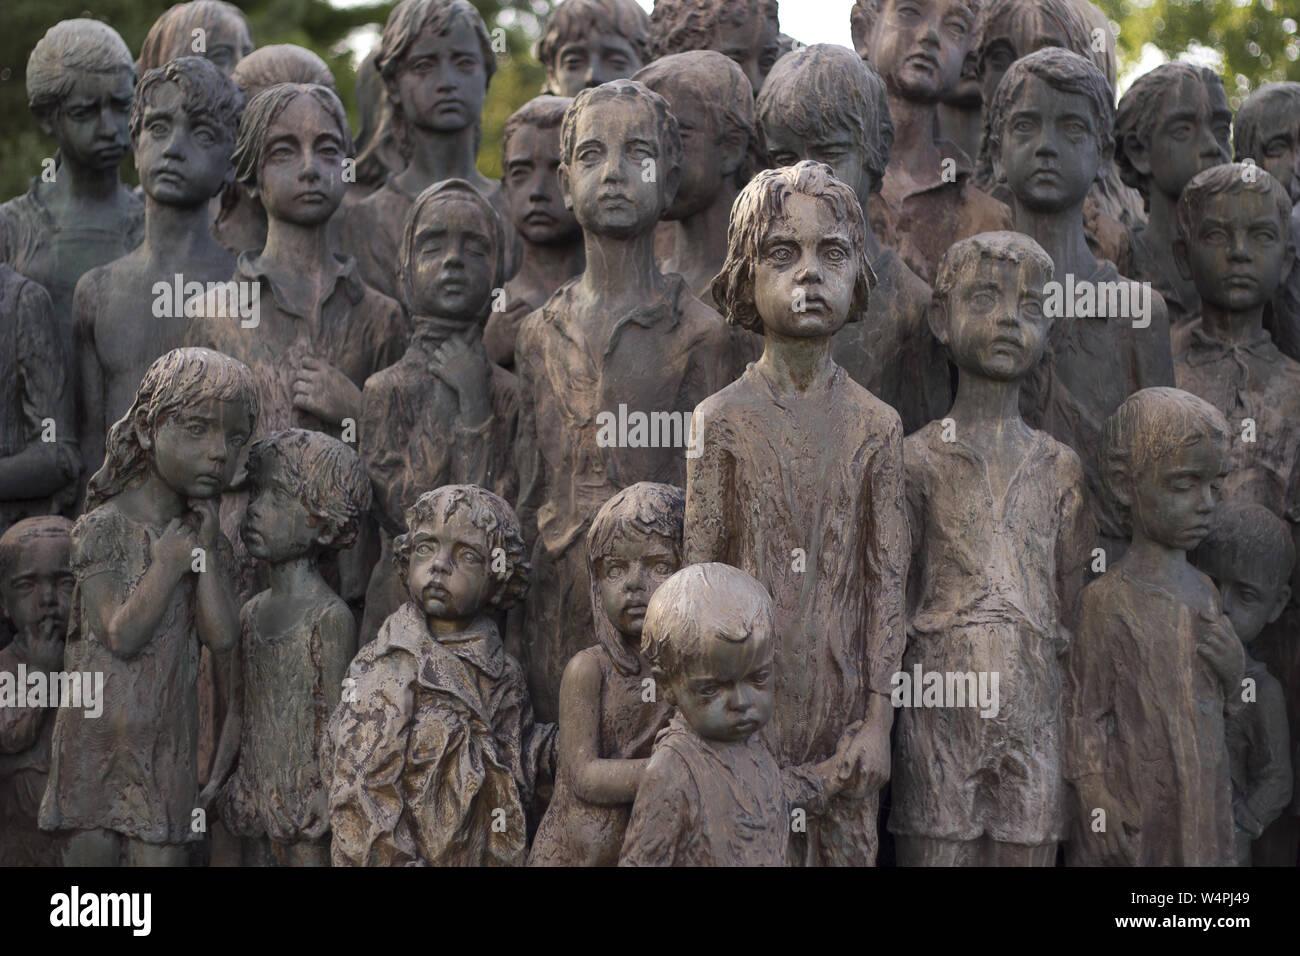 War memorial in Lidice, Czech Republic Stock Photo